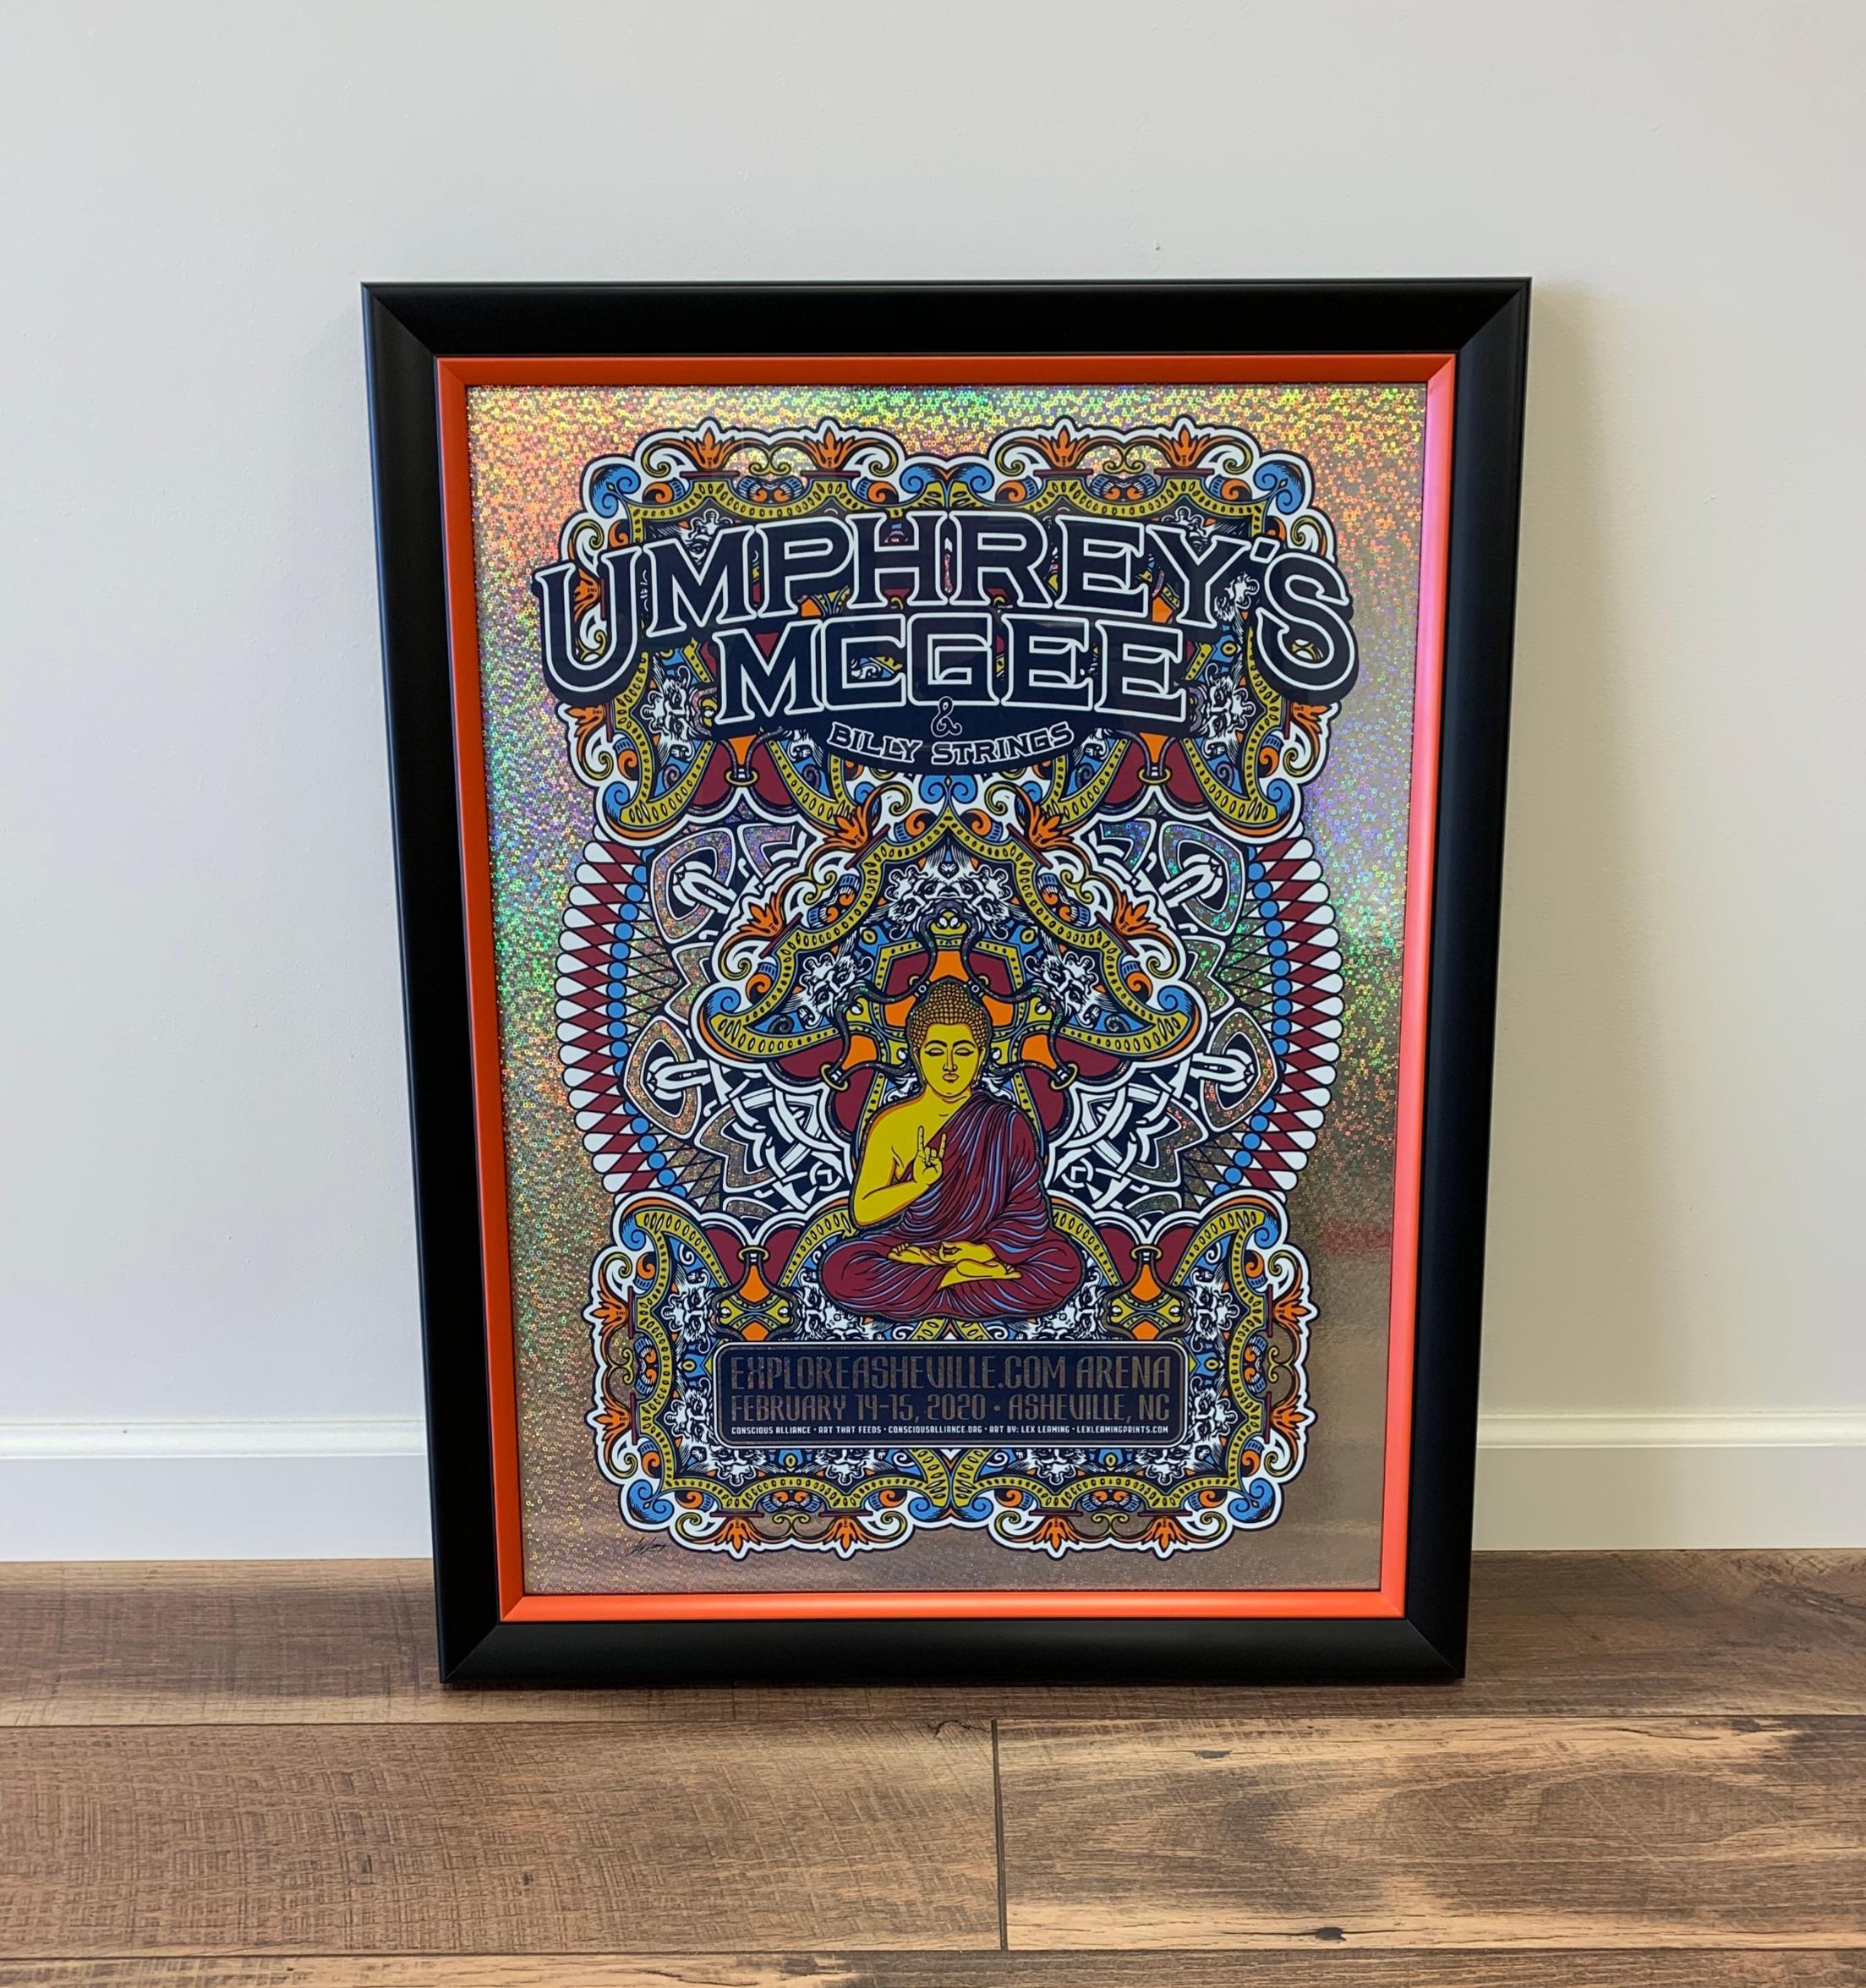 Umphrey's McGee concert poster